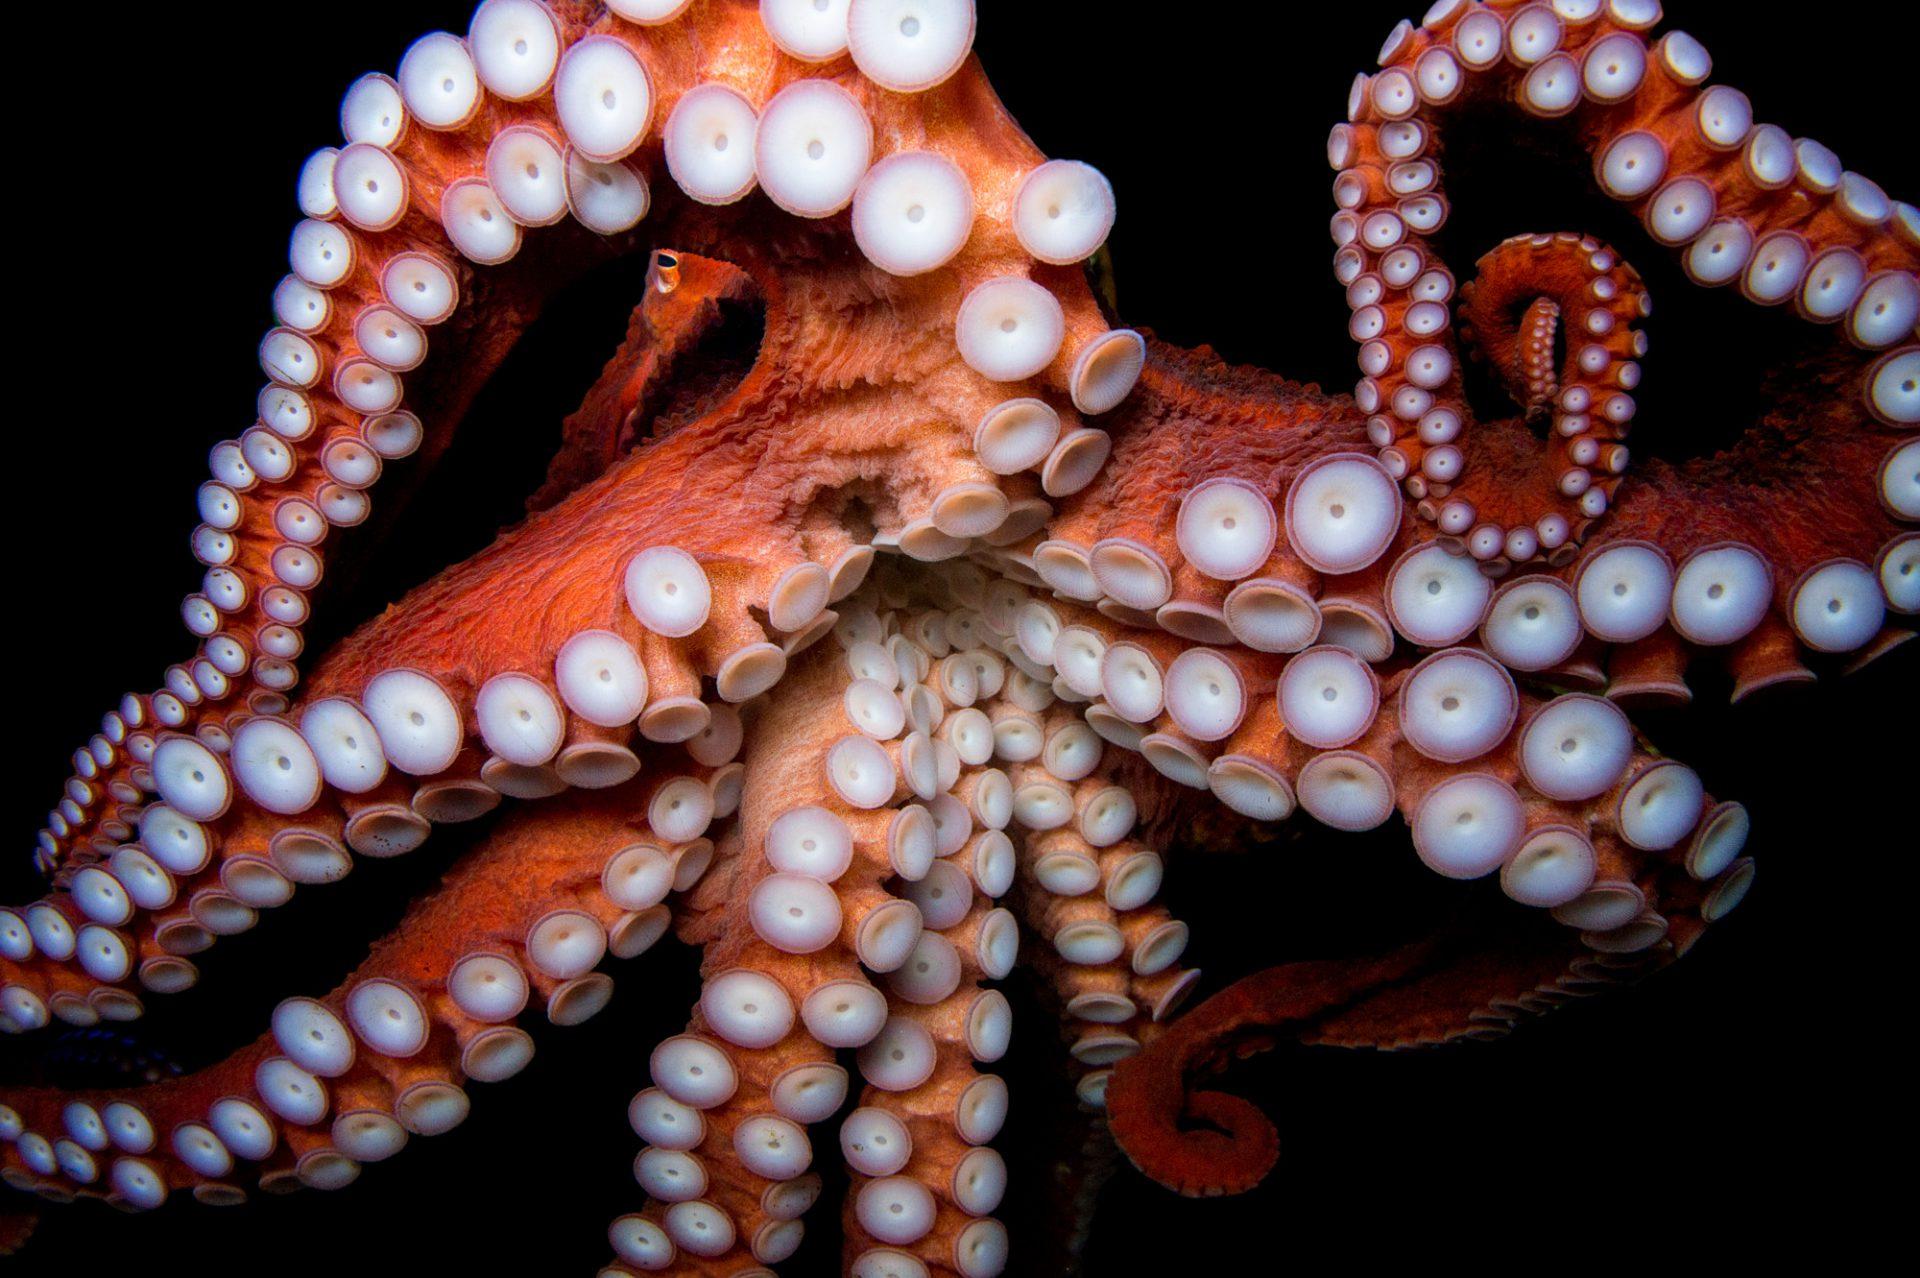 Picture of a giant pacific octopus (Enteroctopus dofleini) at the Dallas World Aquarium.